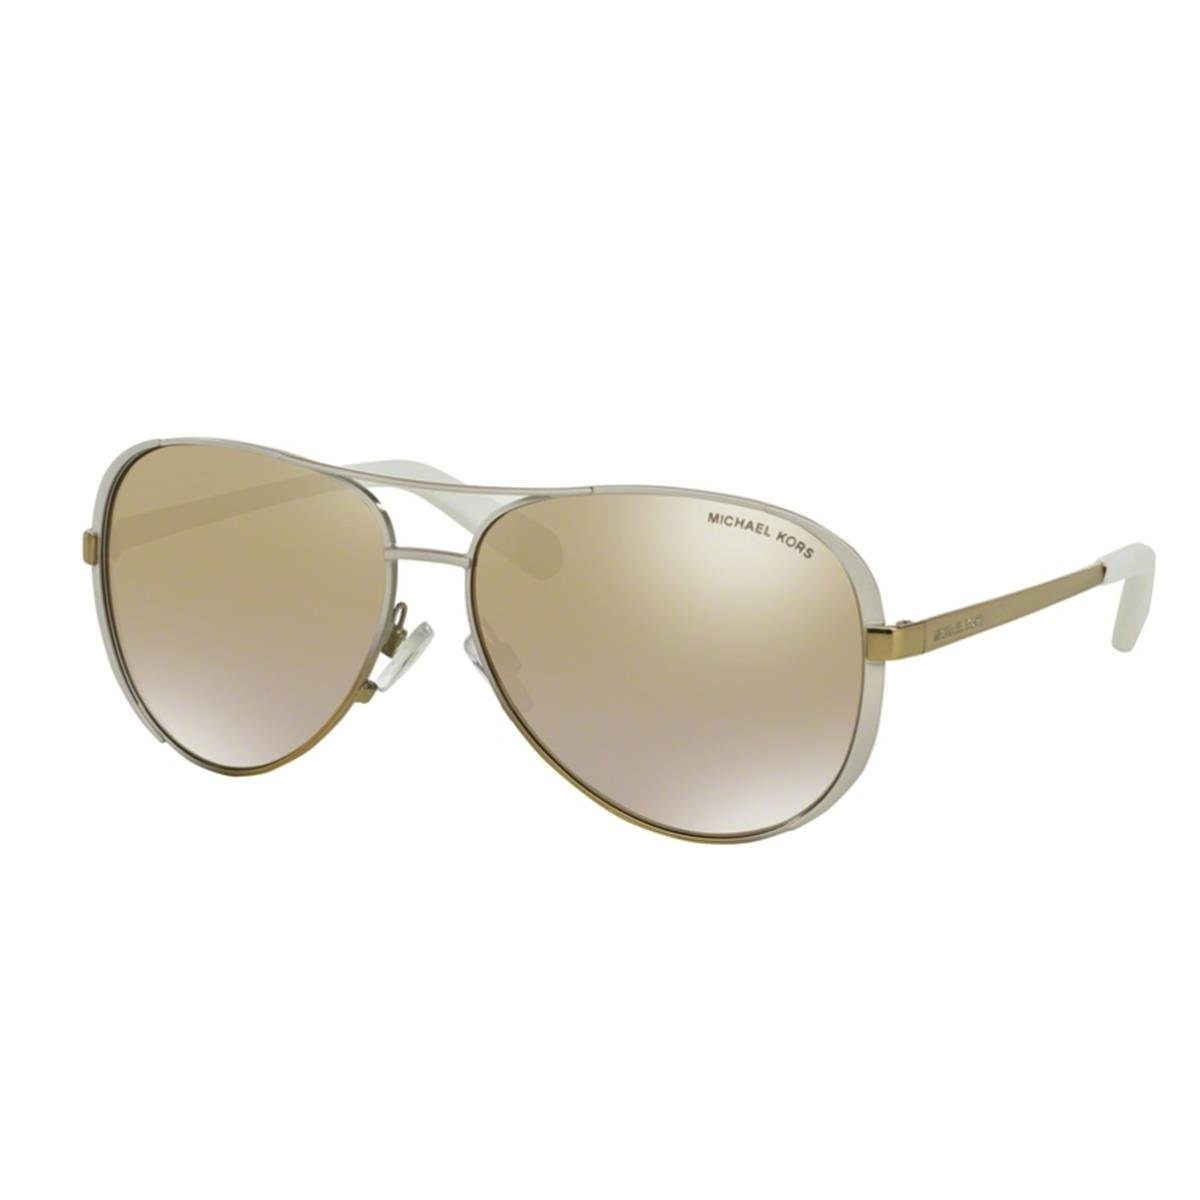 Michael Kors MK5004 10166E 59 Chelsea Sunglasses, White/Gold Fade